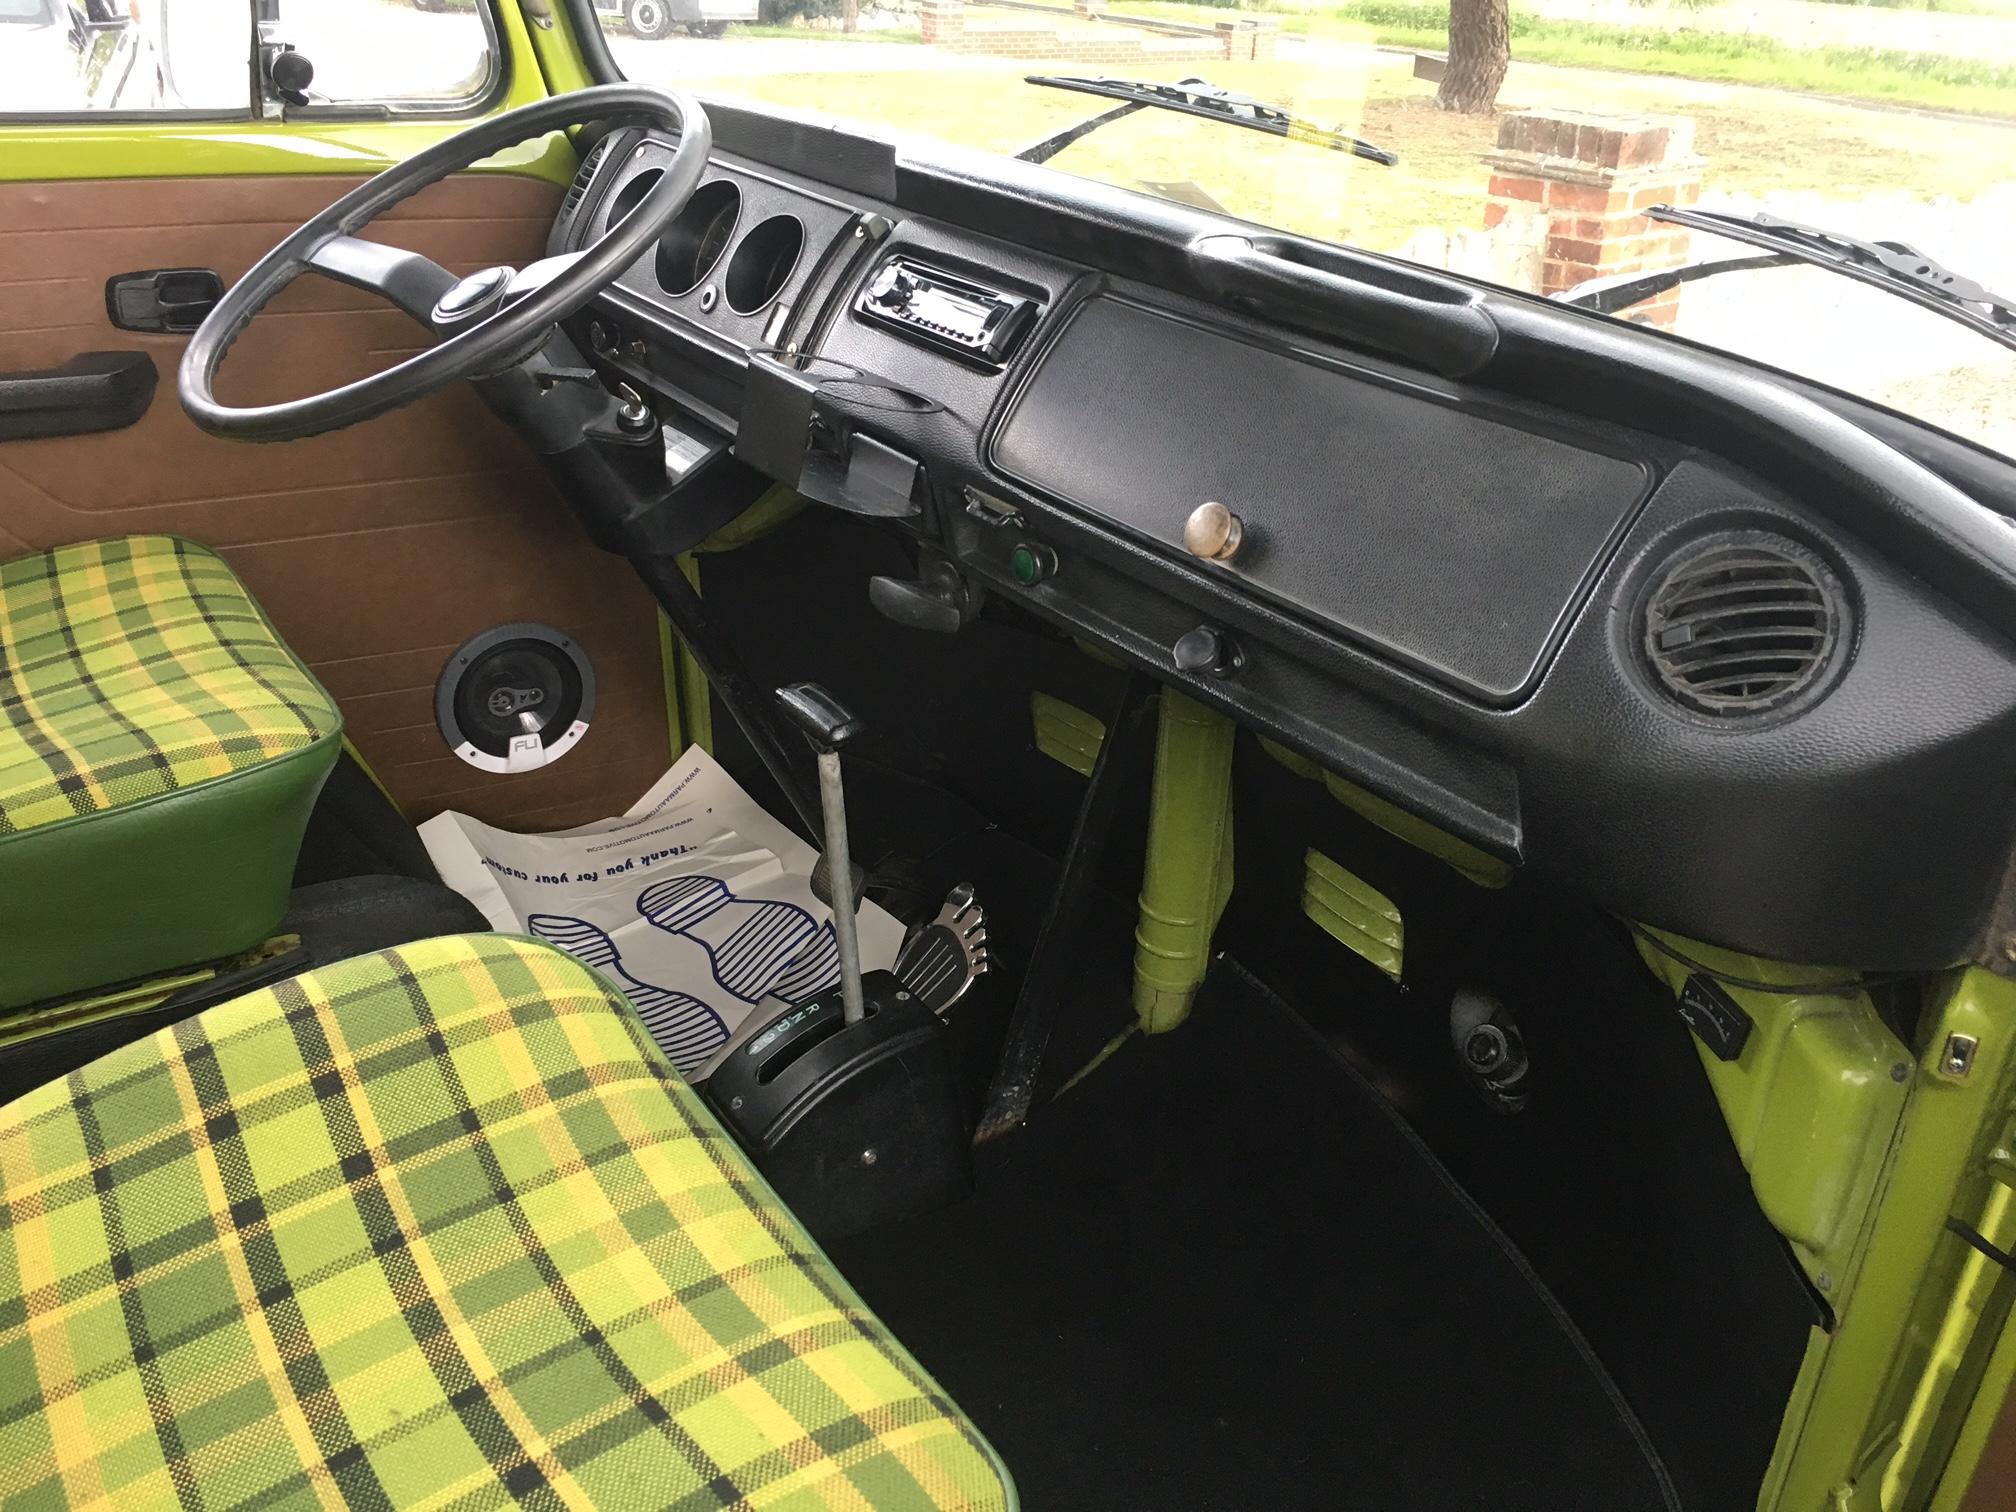 1978 Auto VW Westfalia Camper Van